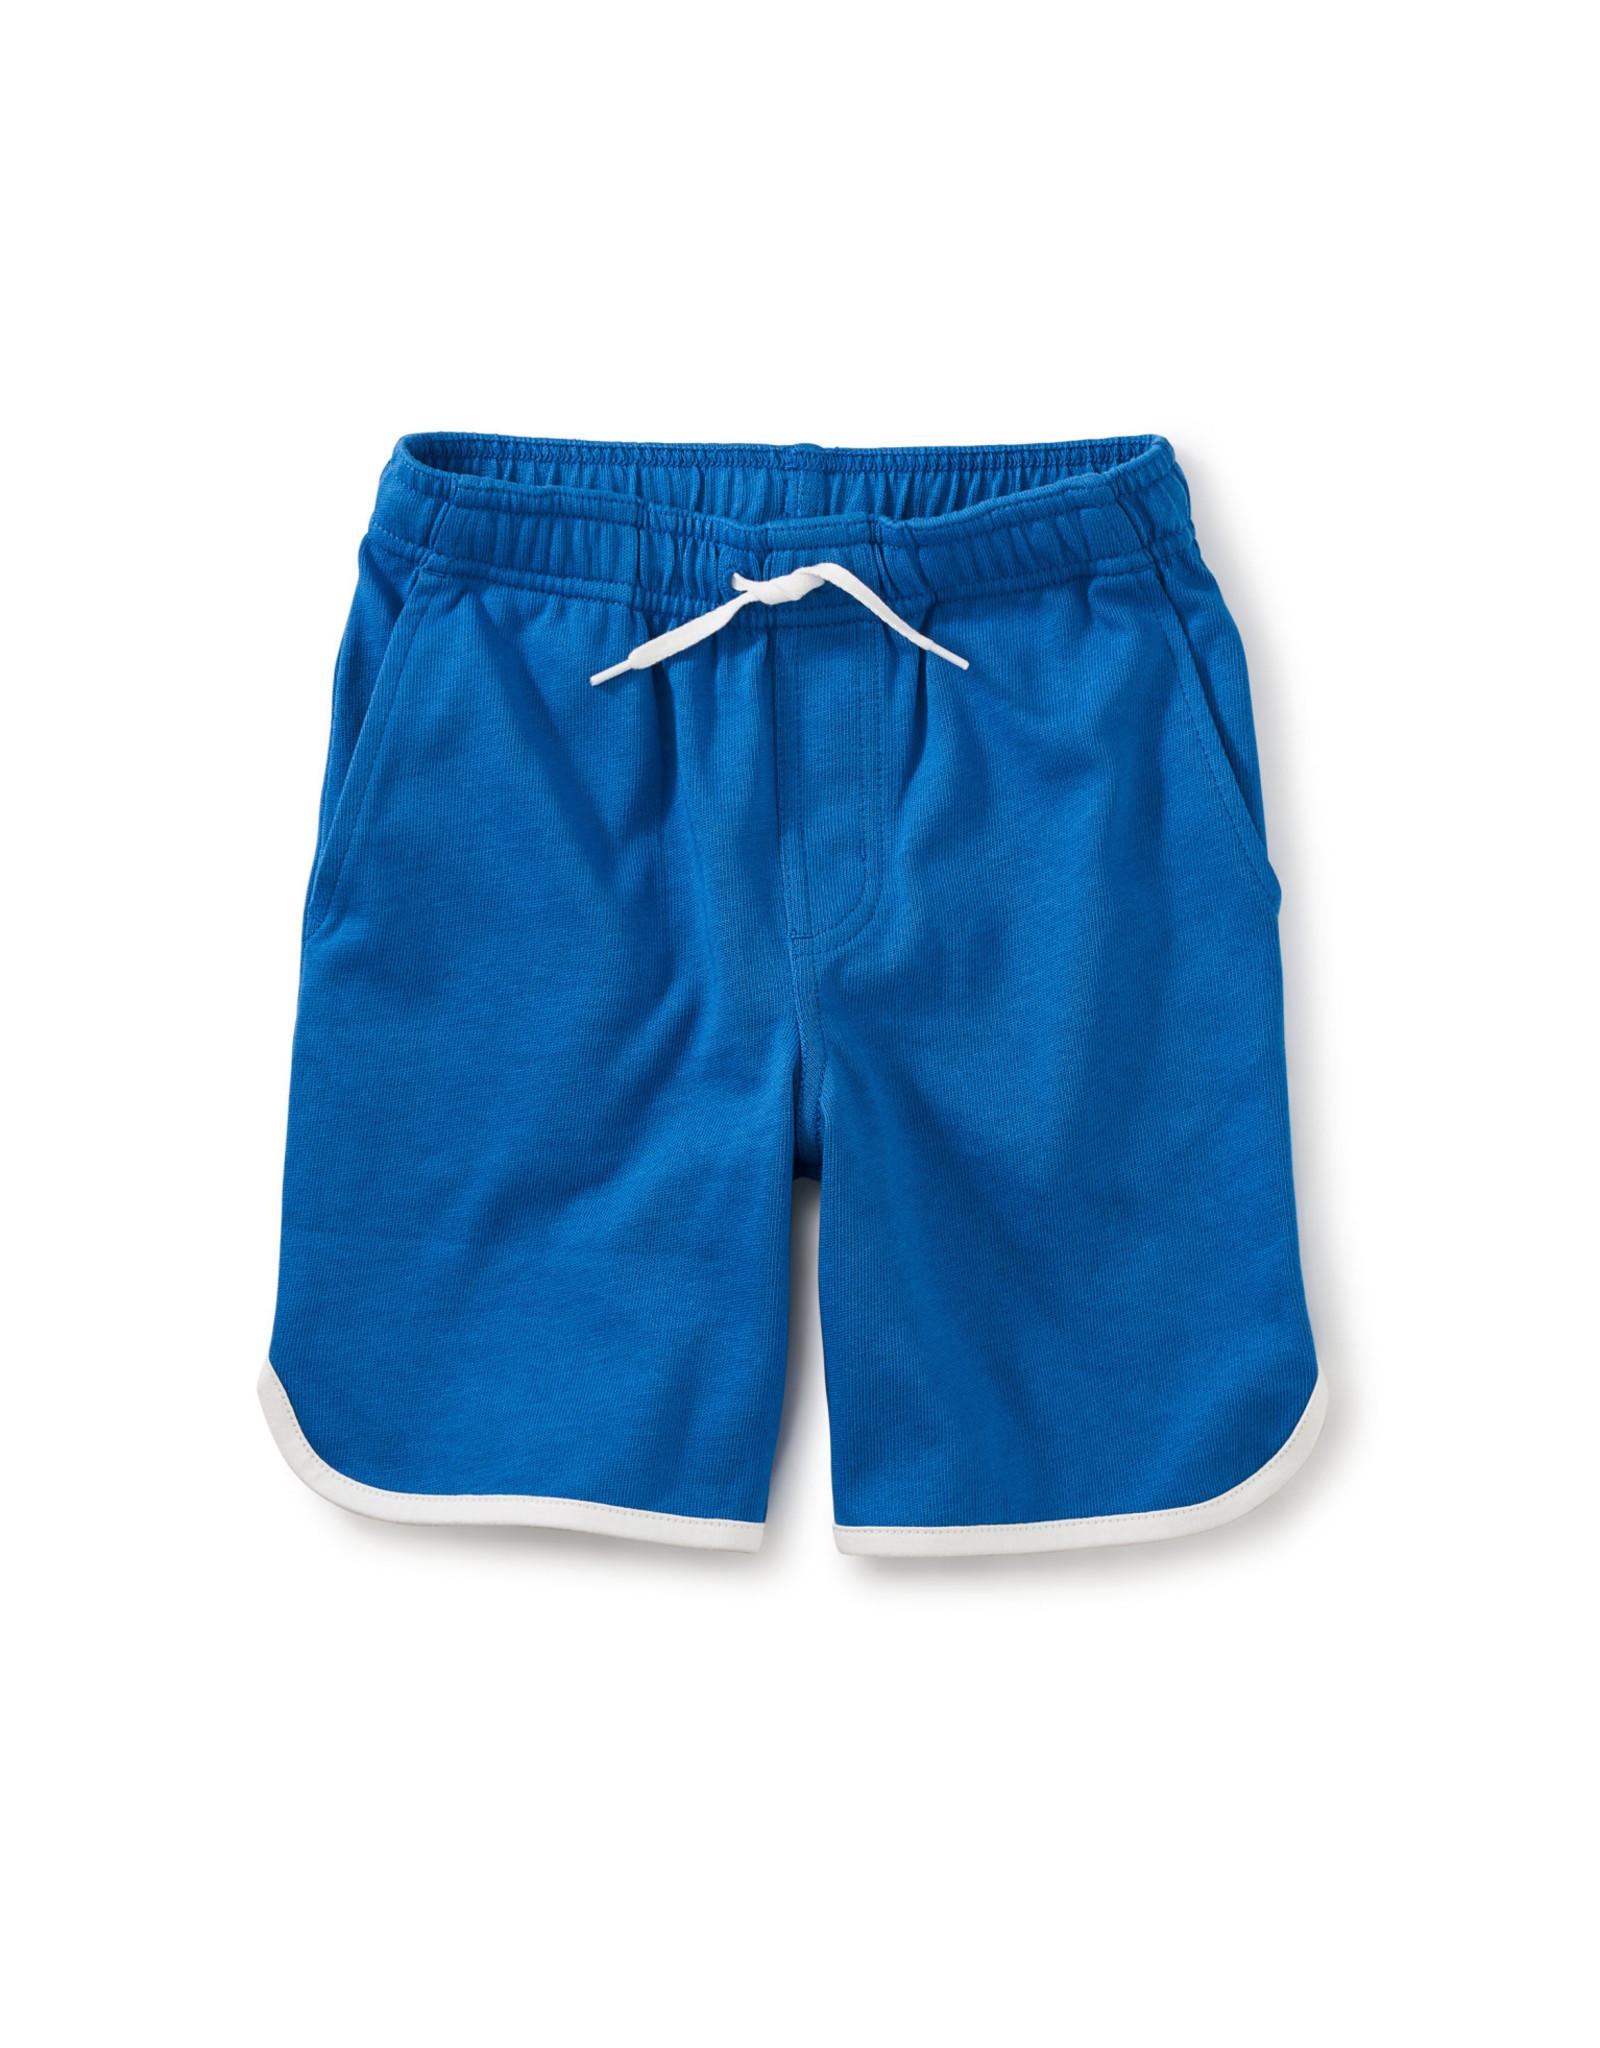 Tea Ringer Shorts, Imperial